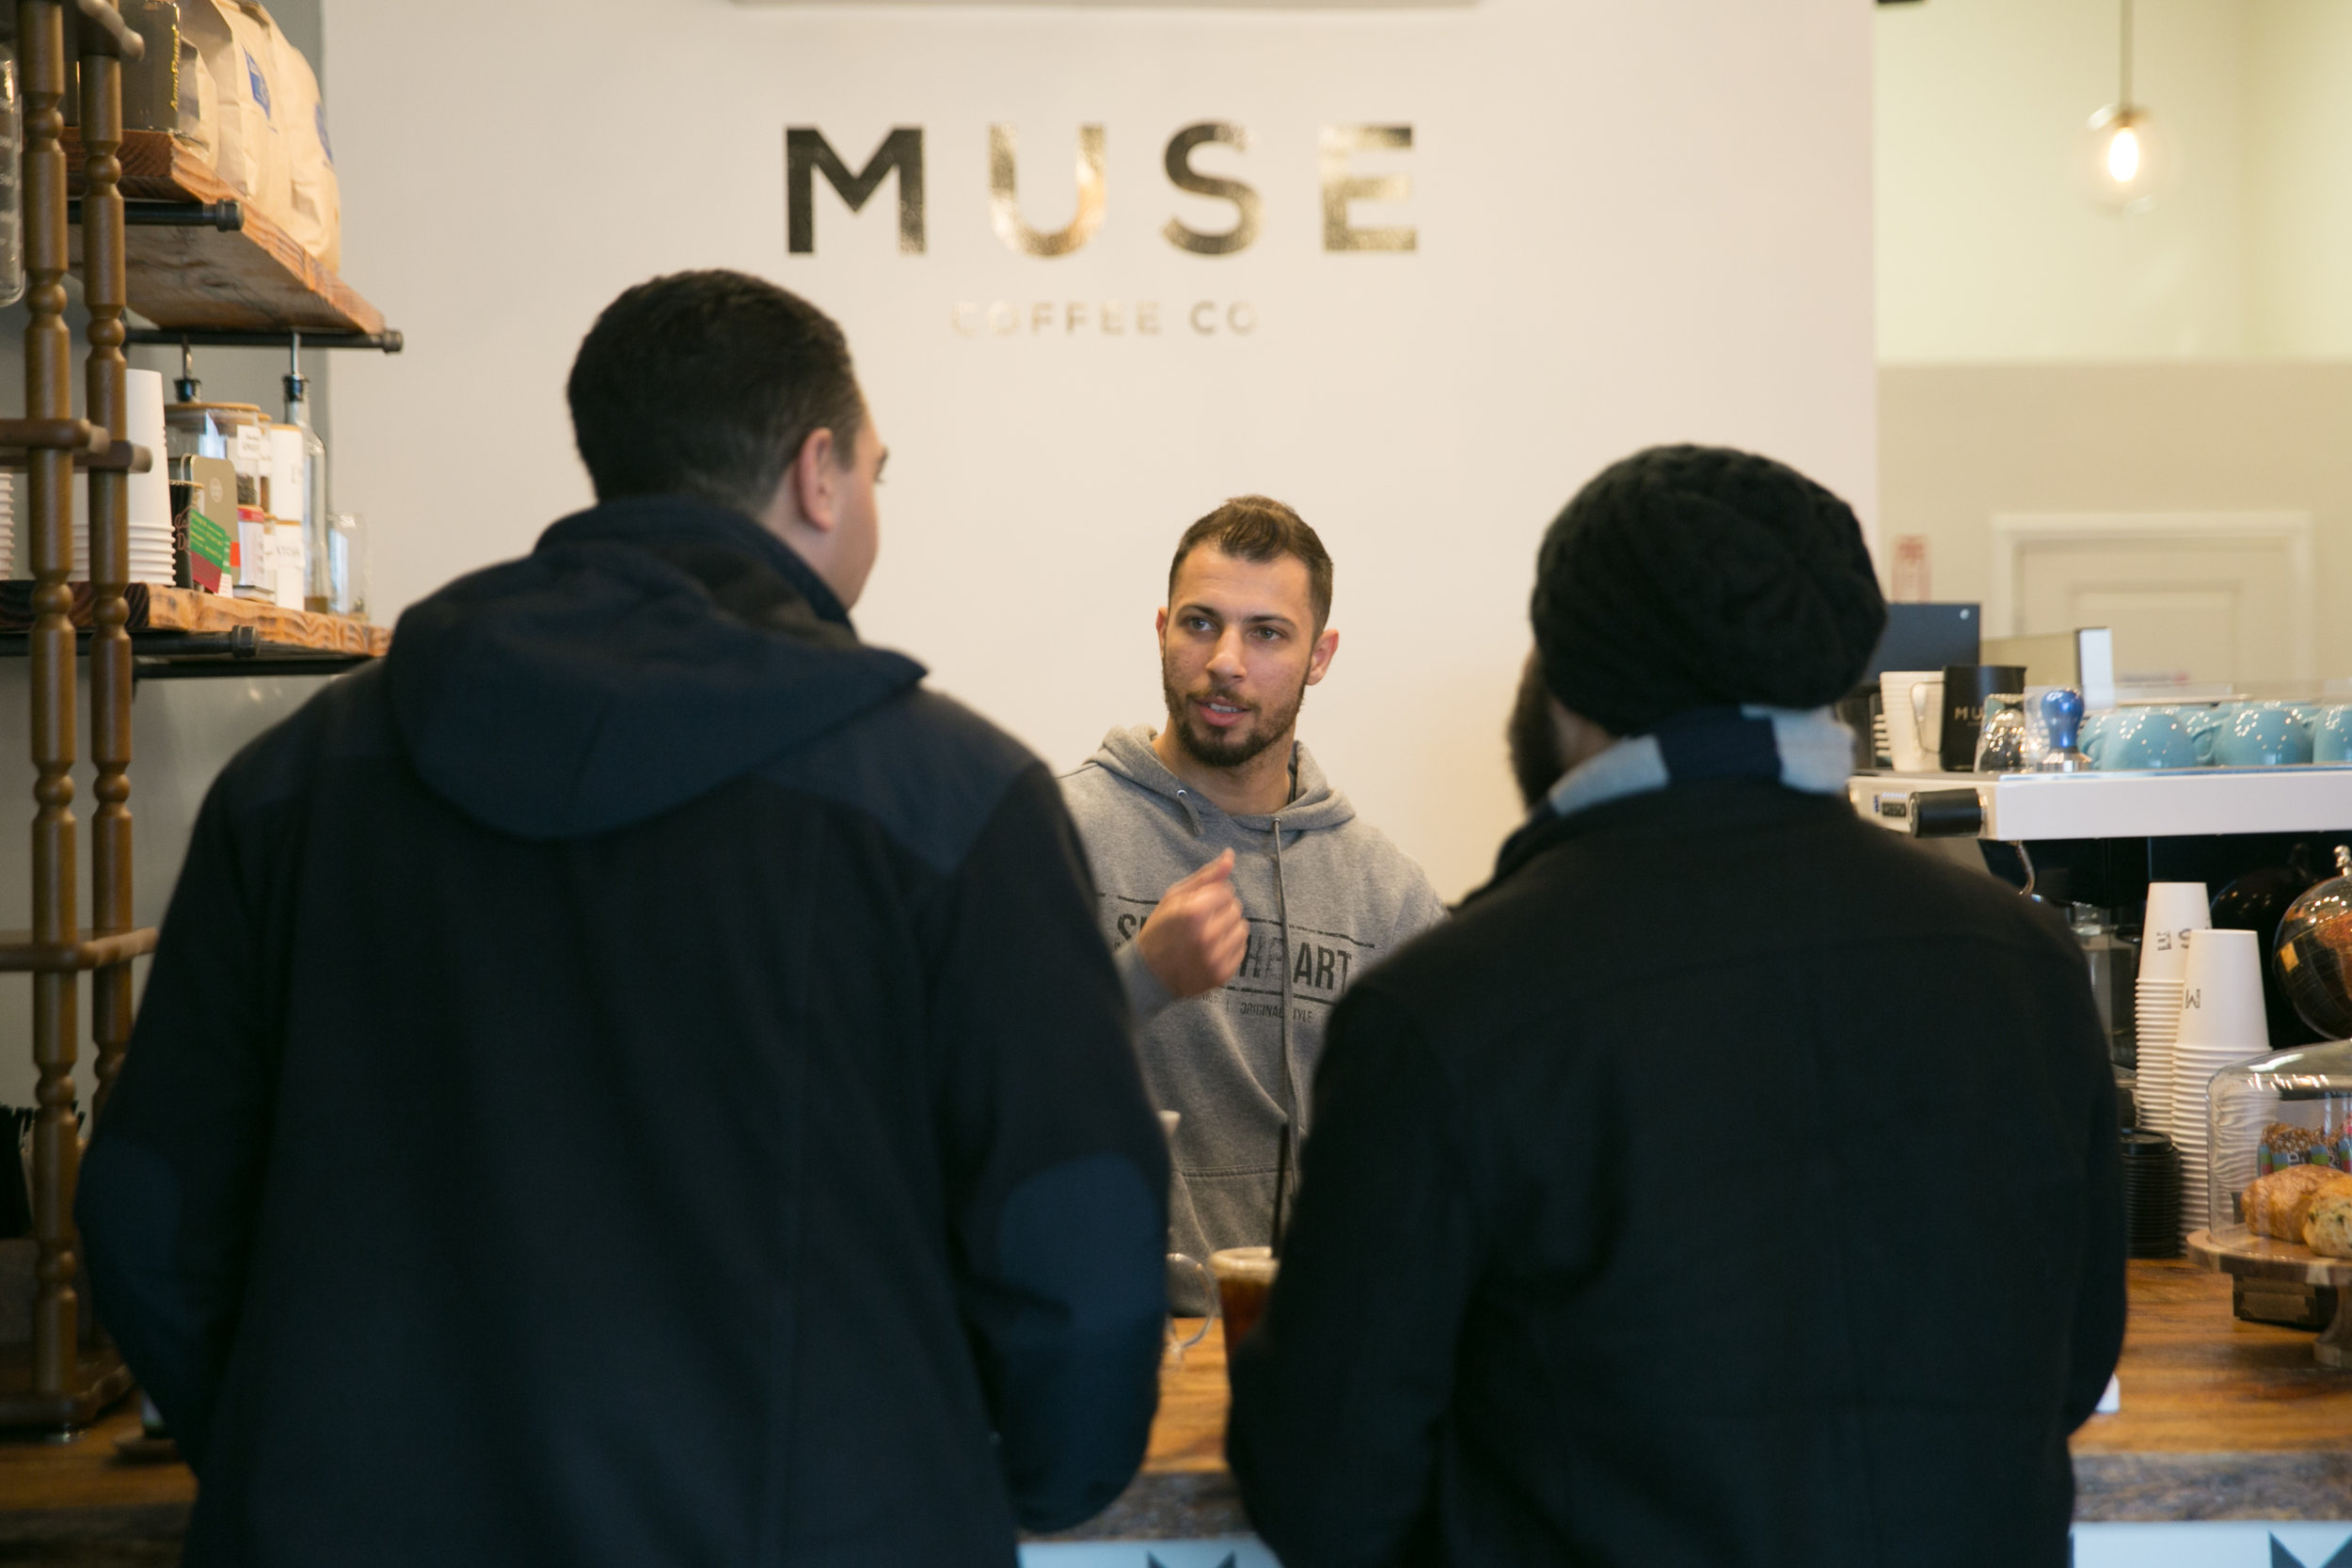 MUSE COFFEE CO, Lyndhurst, NJ